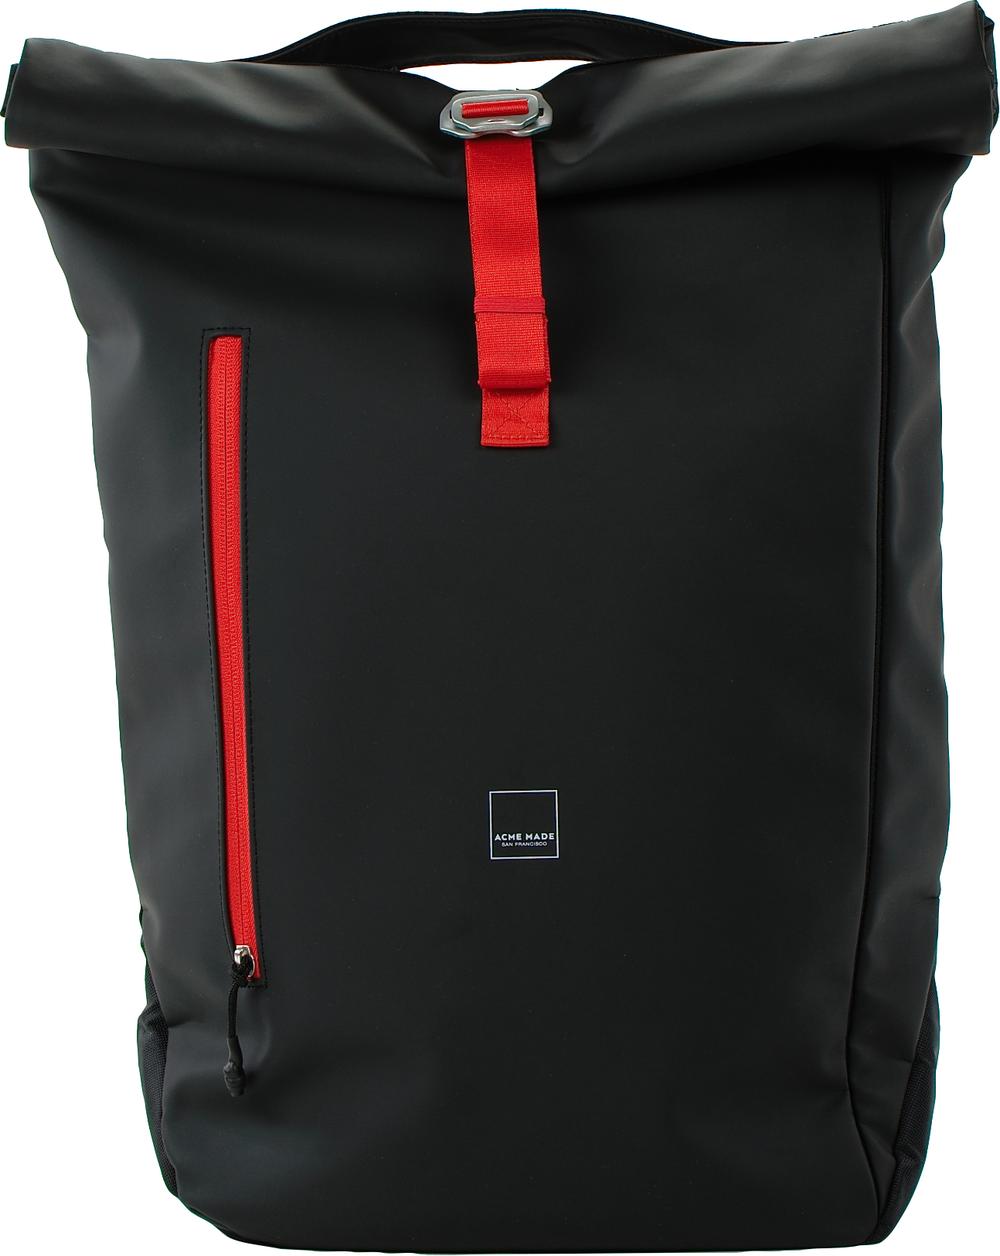 North Point Attache Roll-Top Daypack  Matte Black